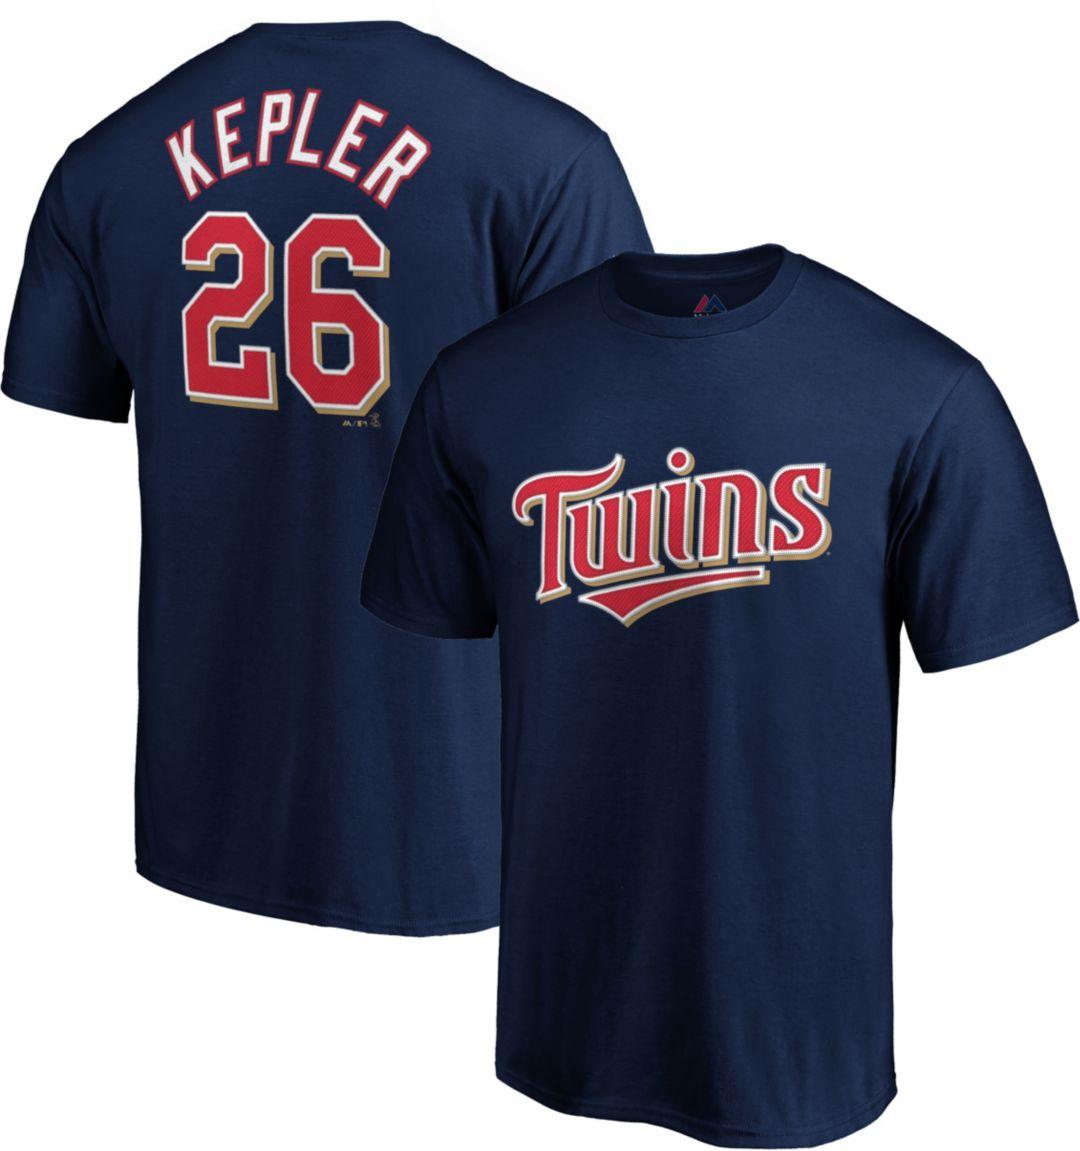 buy online d99d9 e6a0f Majestic Youth Minnesota Twins Max Kepler #26 Navy T-Shirt